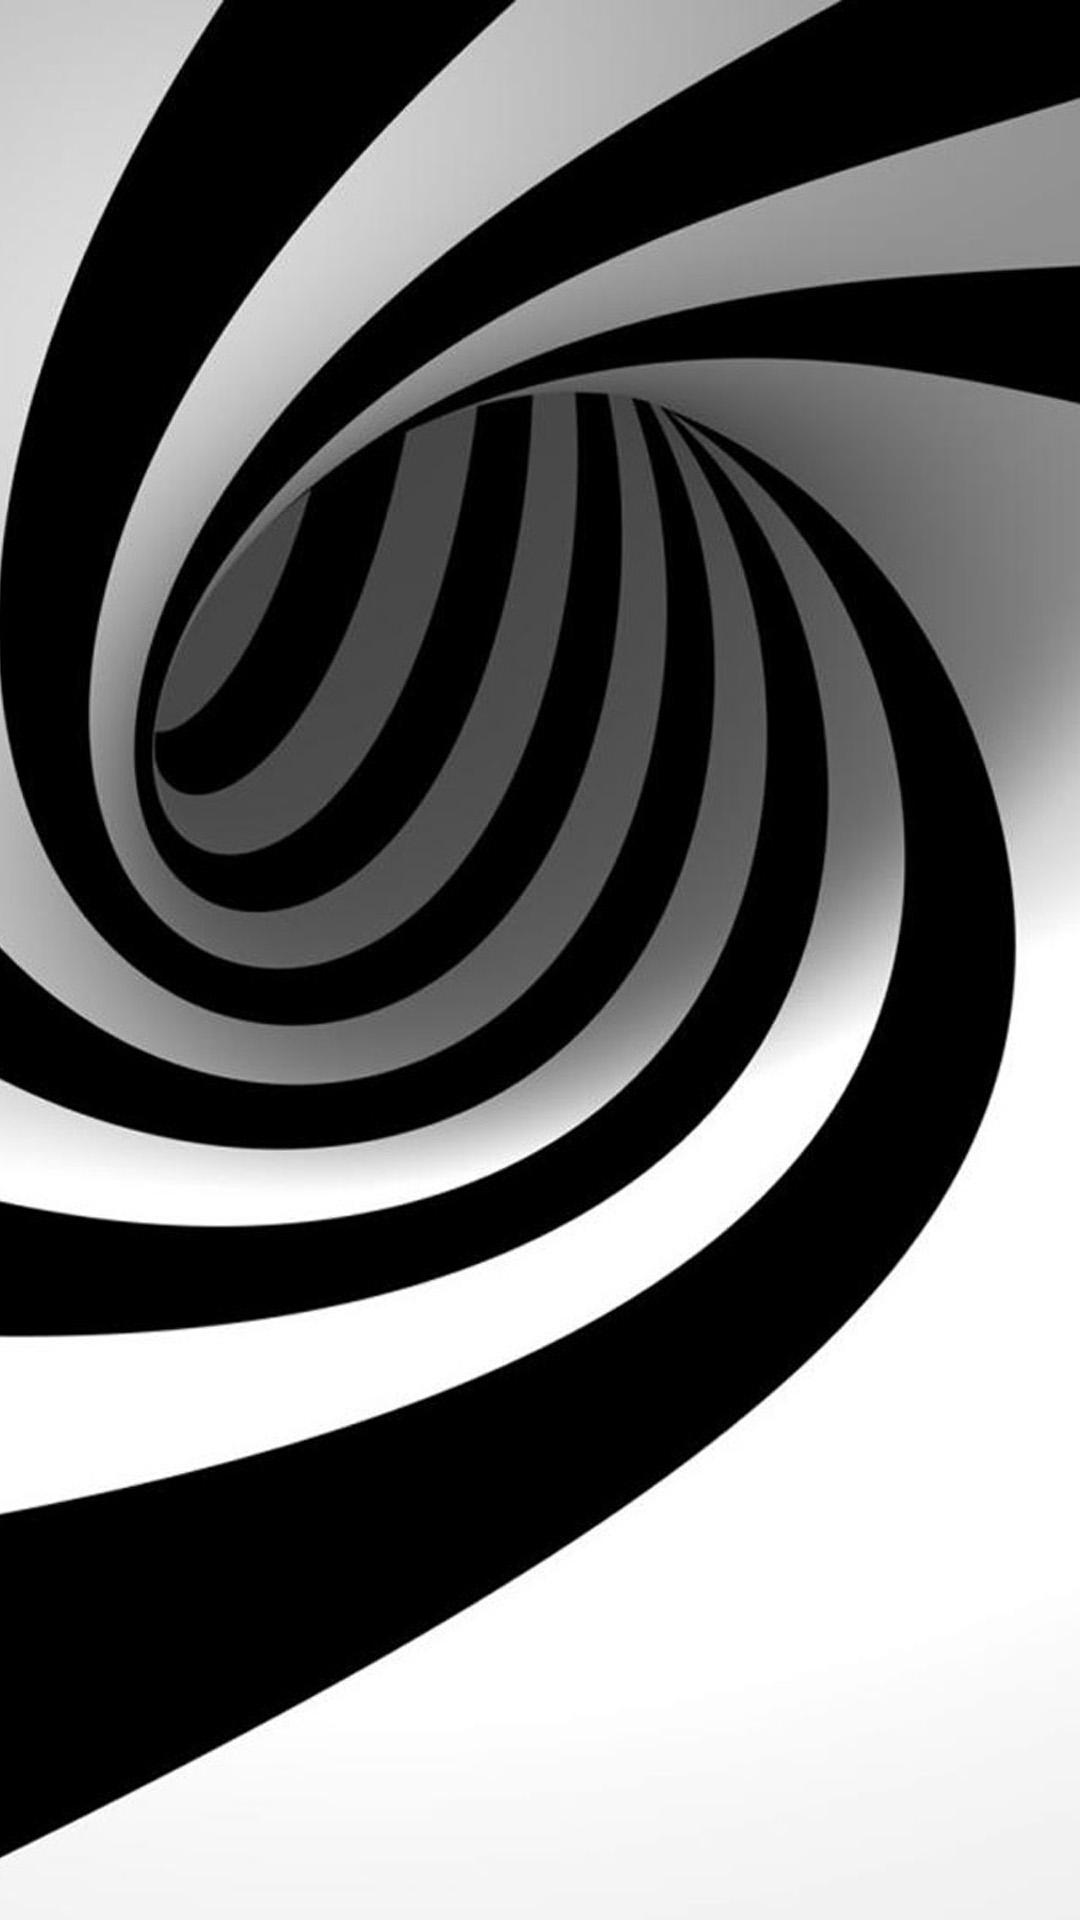 Batman 3d Live Wallpaper Black And White Iphone Wallpaper Pixelstalk Net